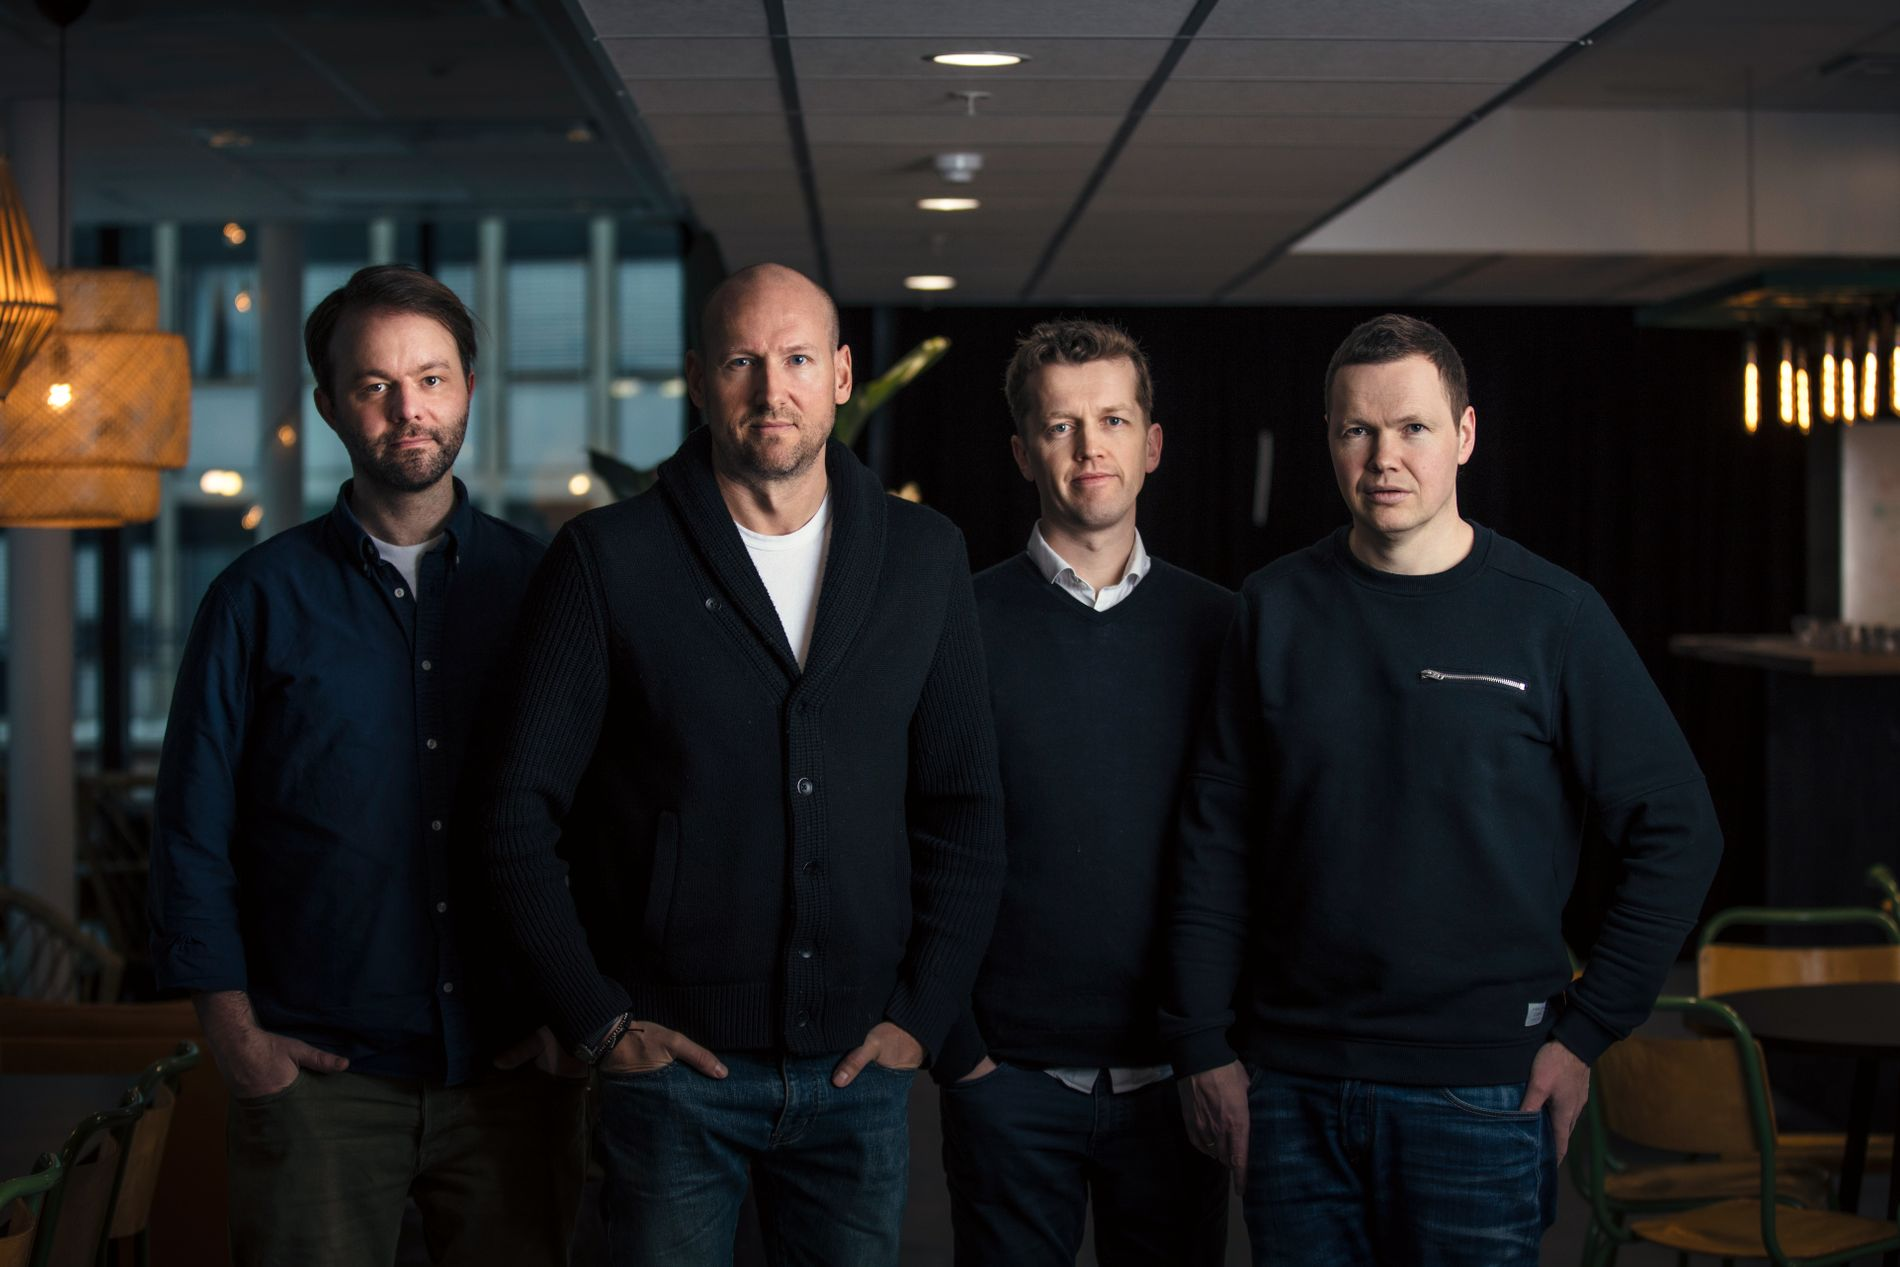 STARTER UTDANNING: Amund Bjørklund, Tor Erik Hermansen, Lars Hustoft og Magnus Beite starter LIMPI - musikkutdanning på Lillehammer.